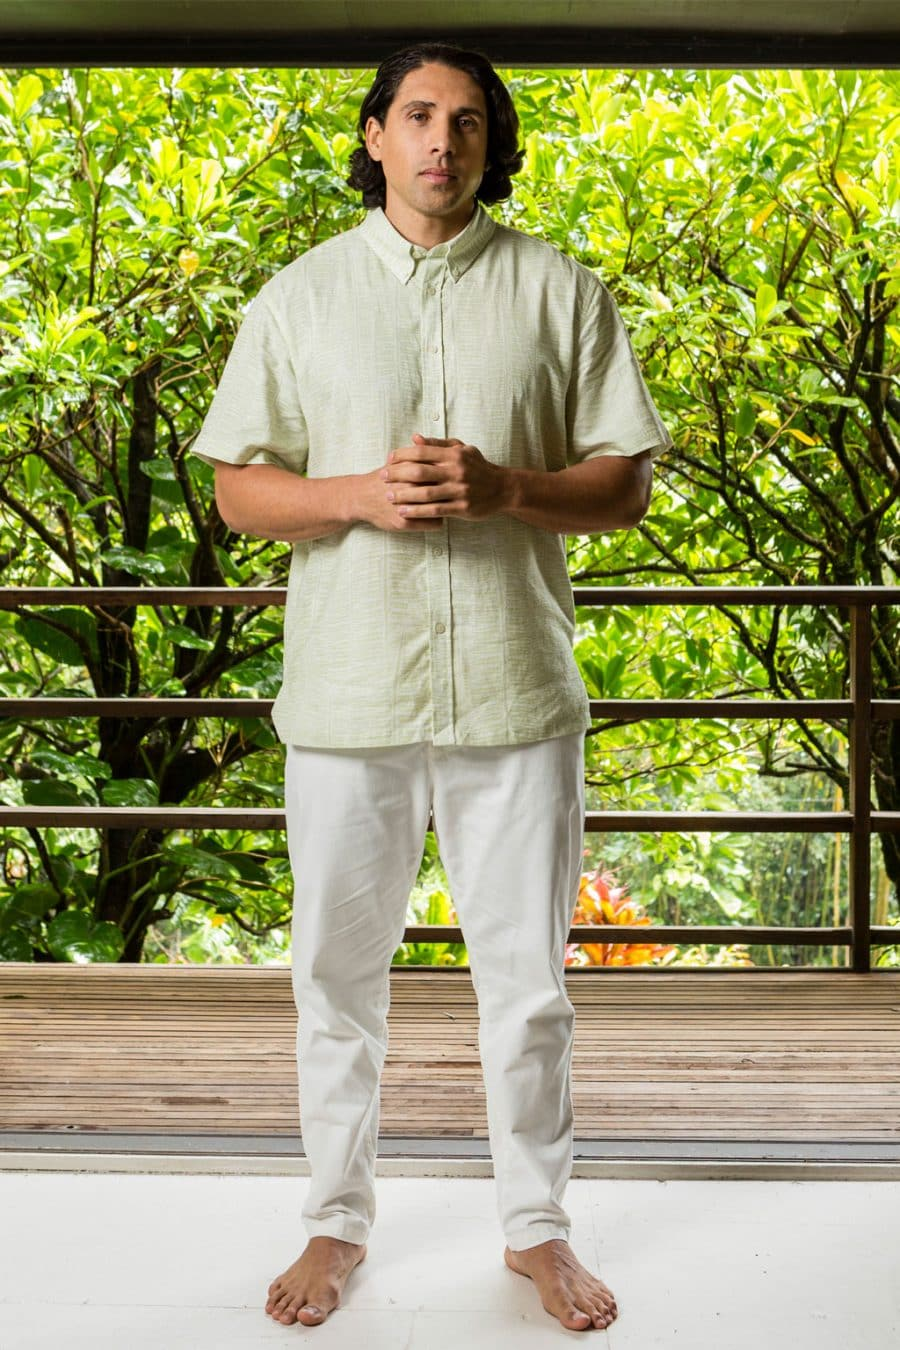 Male model wearing Aloha Short Sleeve in Margarita Tofu Kupukupu pattern front view